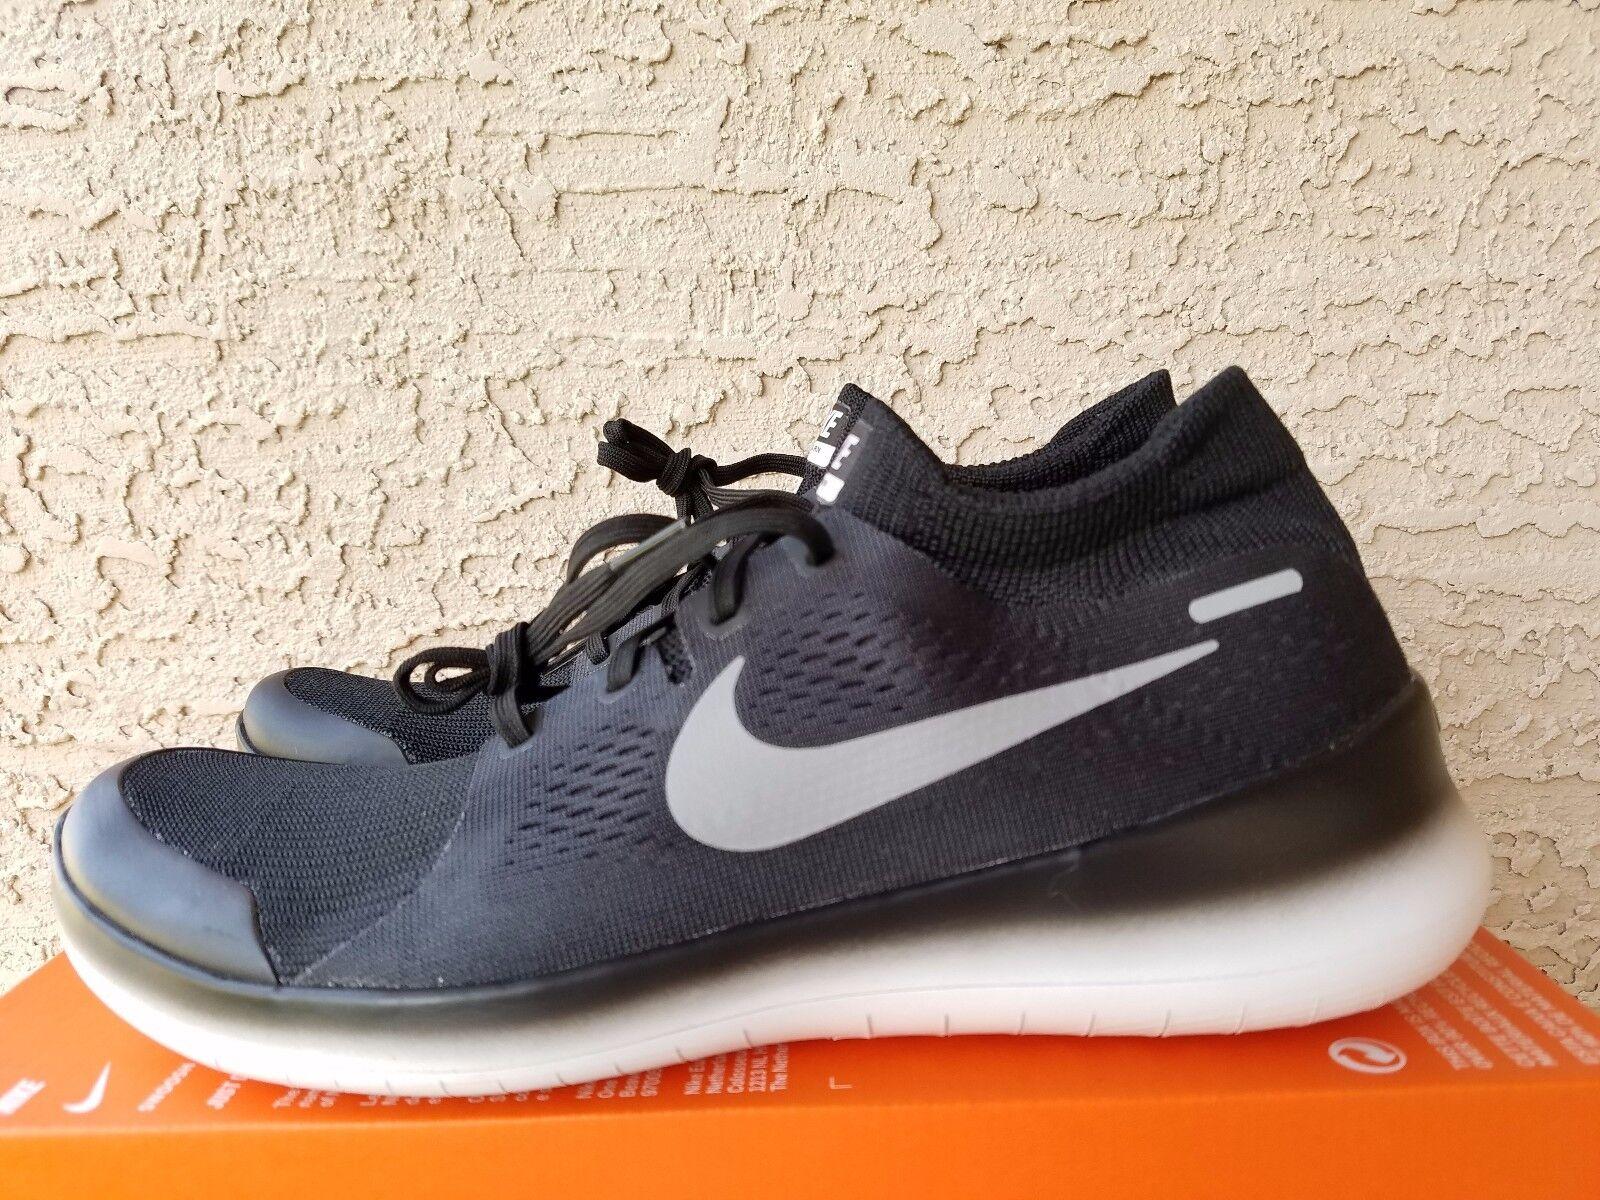 Nike Beta RN Black White Black 836223-001 836223-001 836223-001 Running shoes Size 11.5 d1eb68